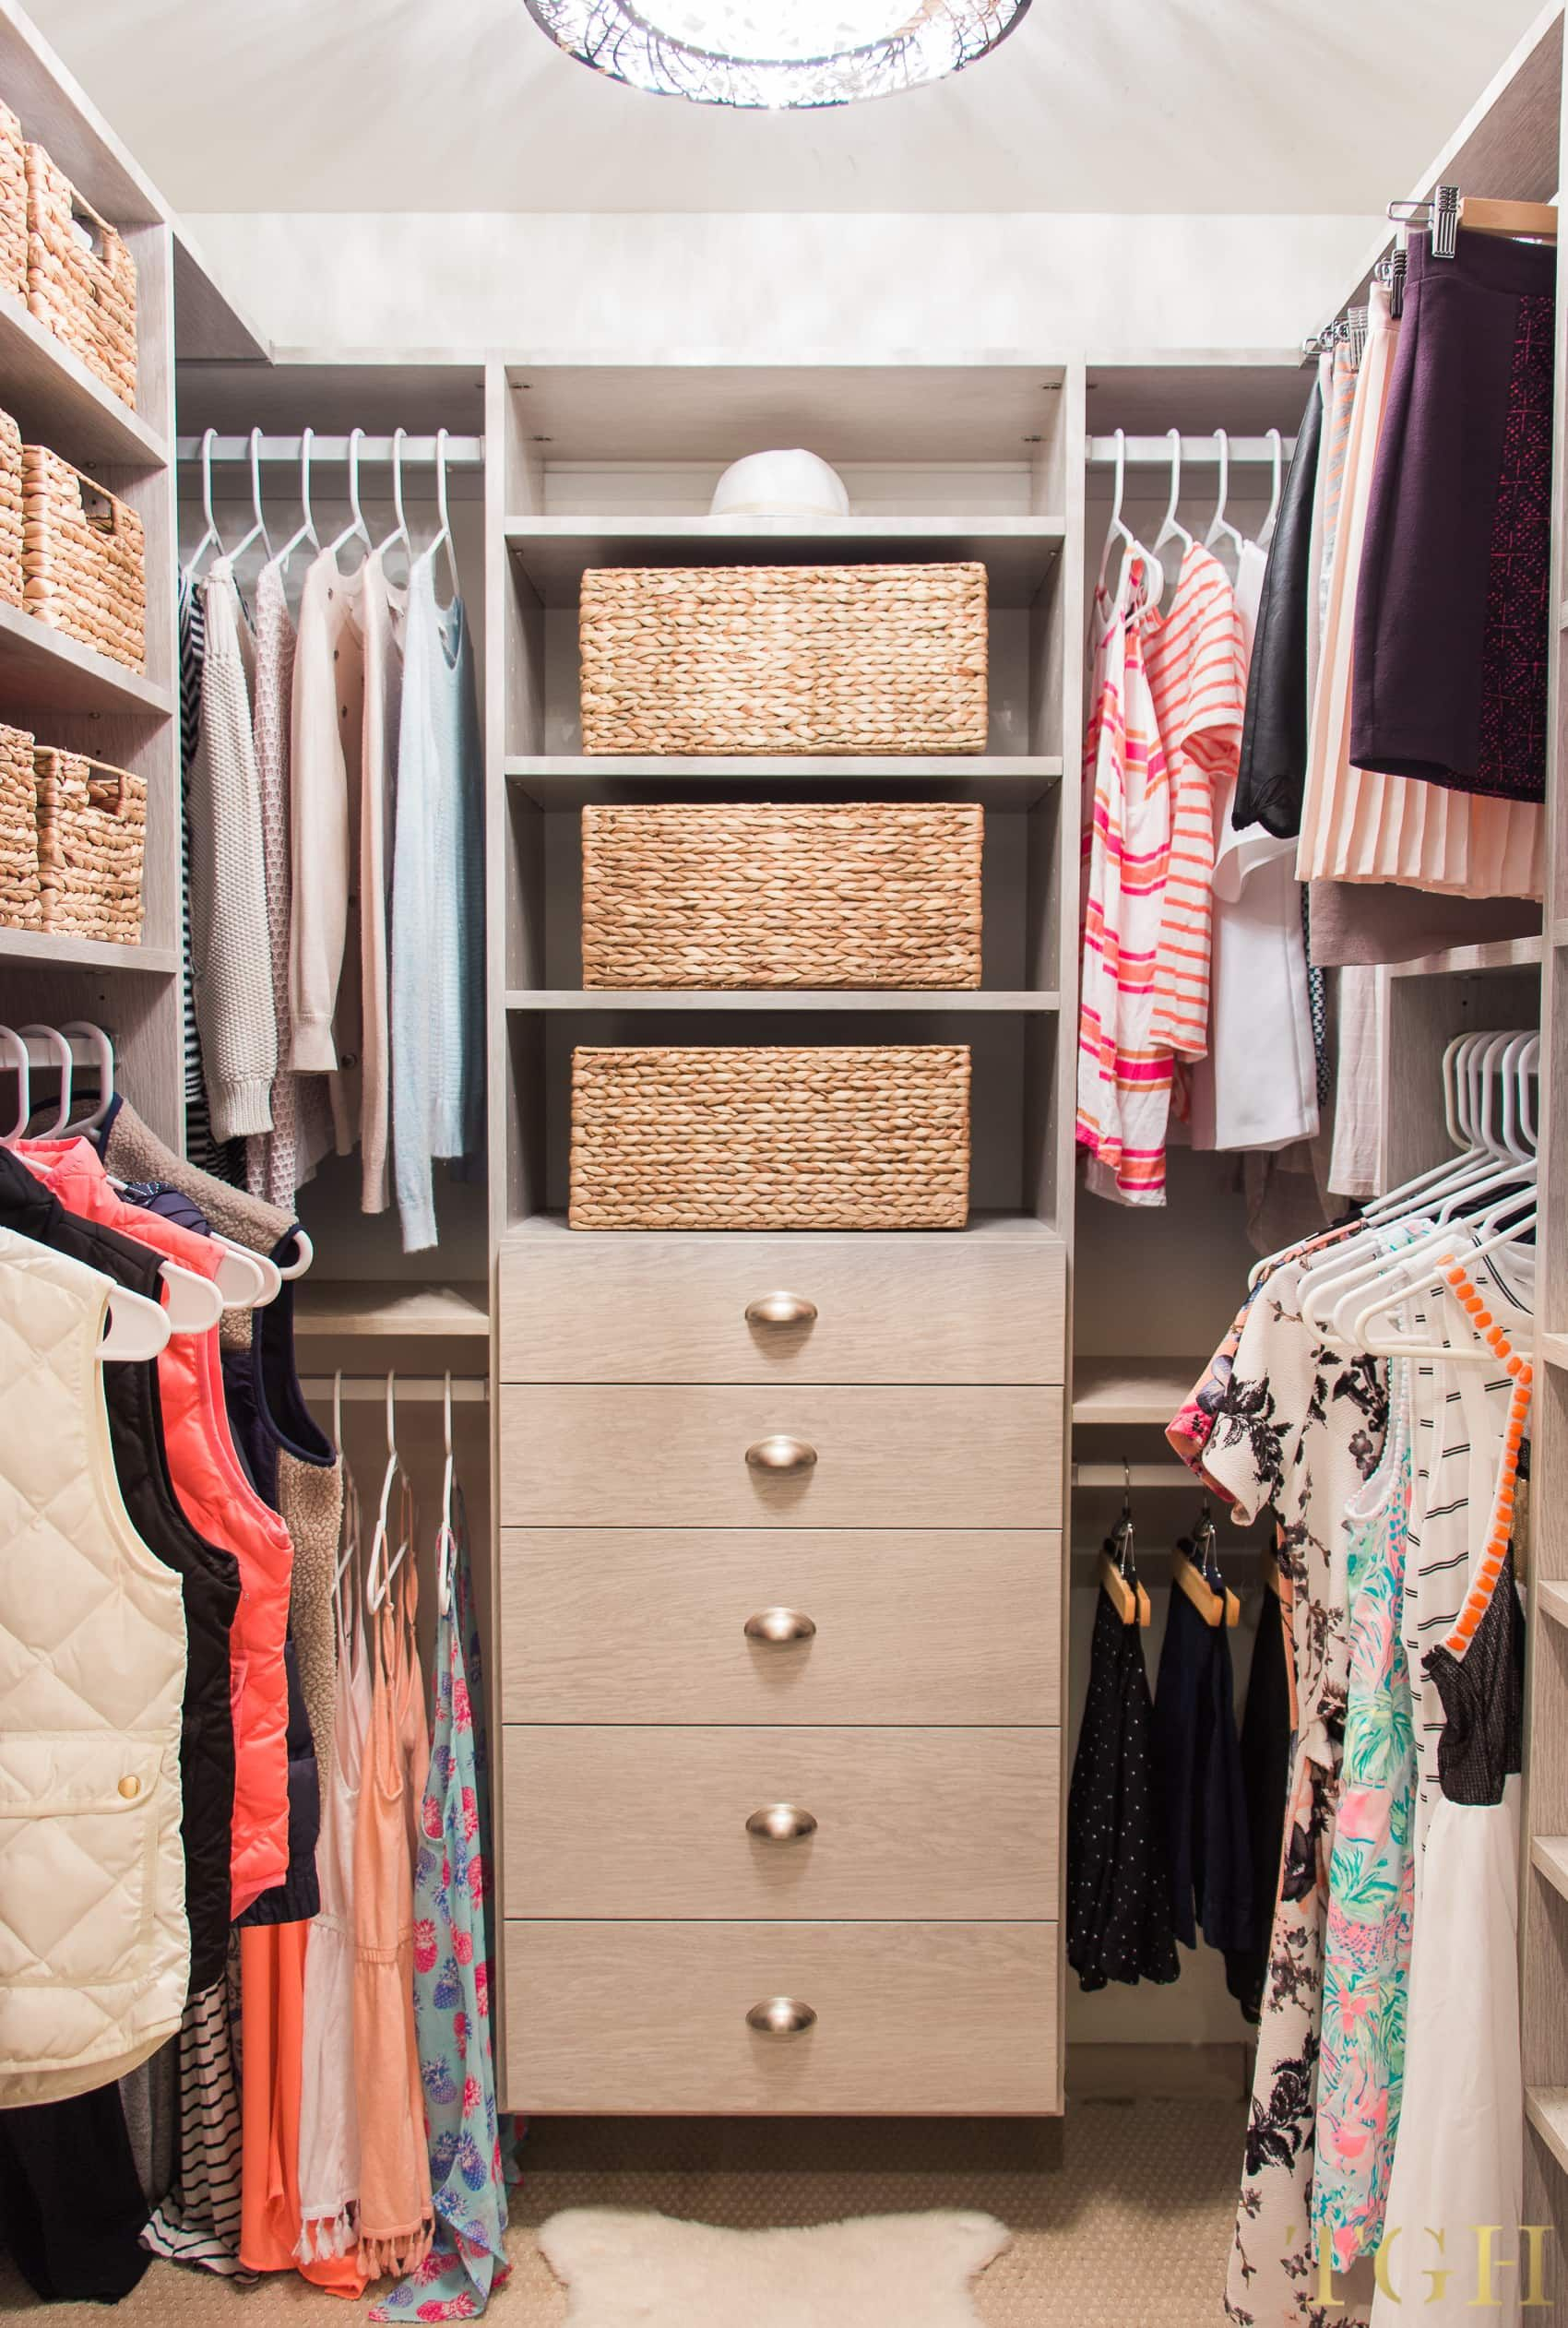 California Closets Review With Pricing The Greenspring Home California Closets Bedroom Organization Closet Closet Small Bedroom